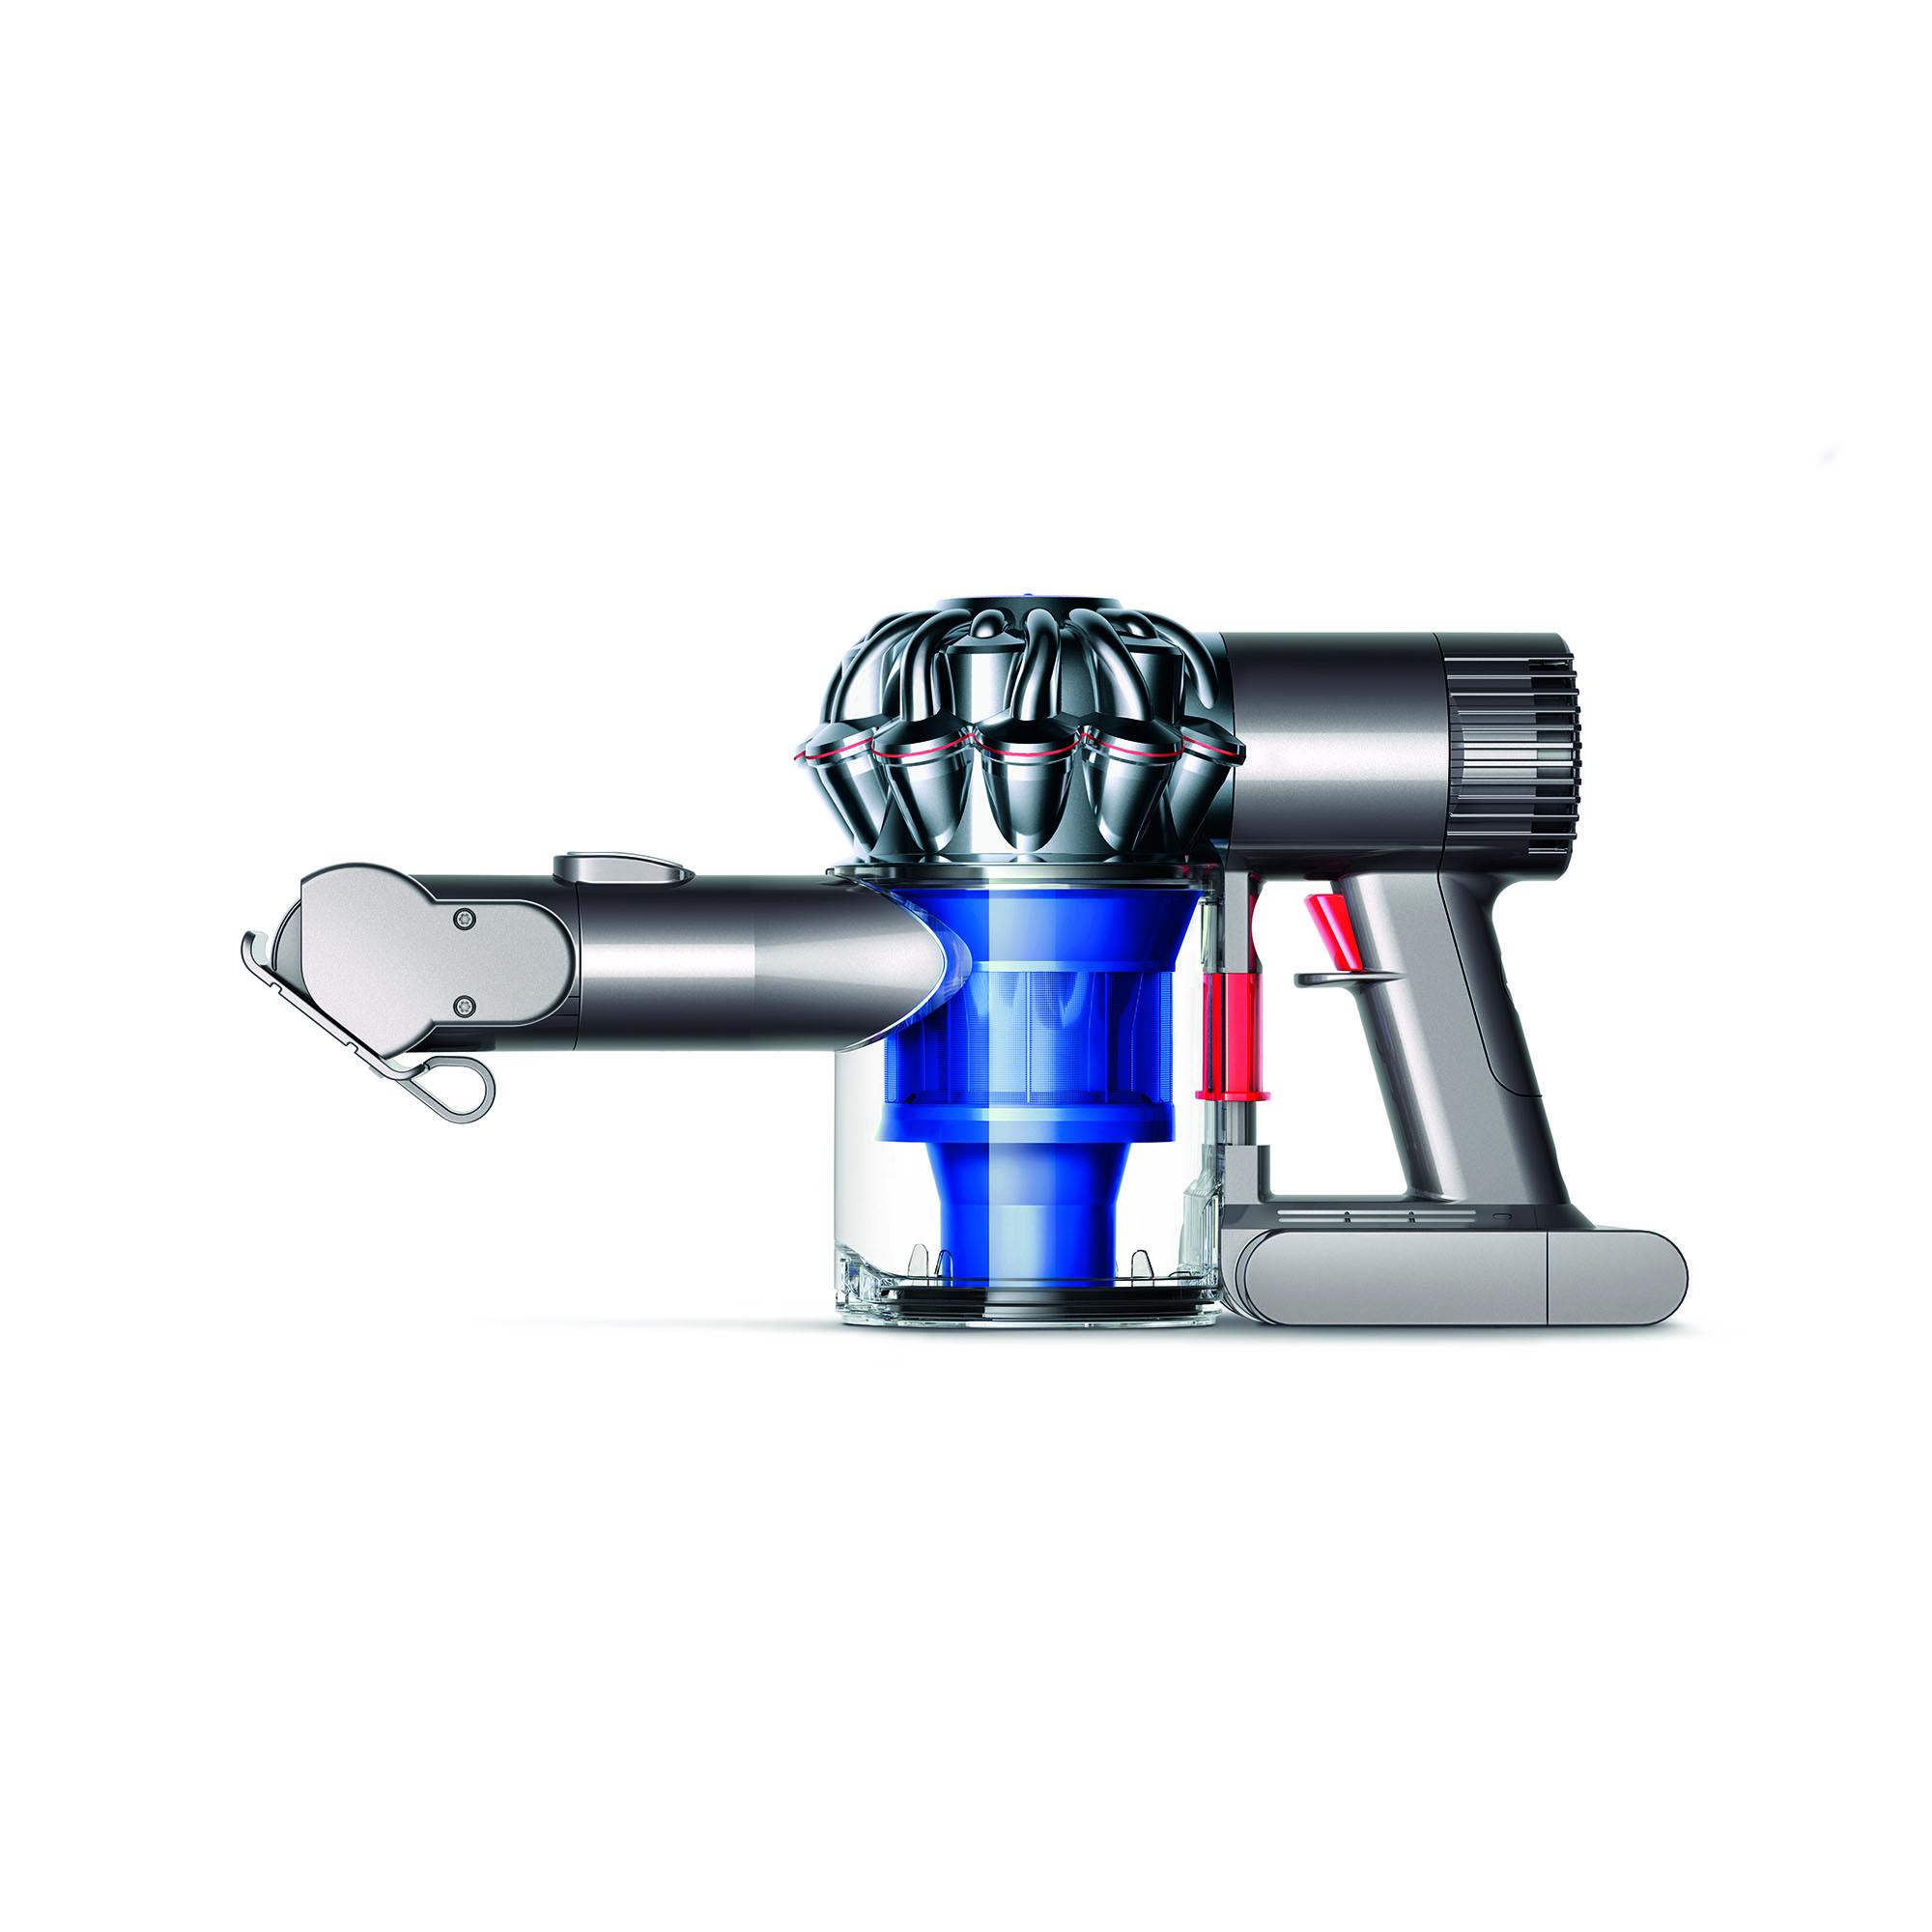 Dyson V6 Trigger Max Handheld Vacuum | Blue | Refurbished : $87.99 AC + FS